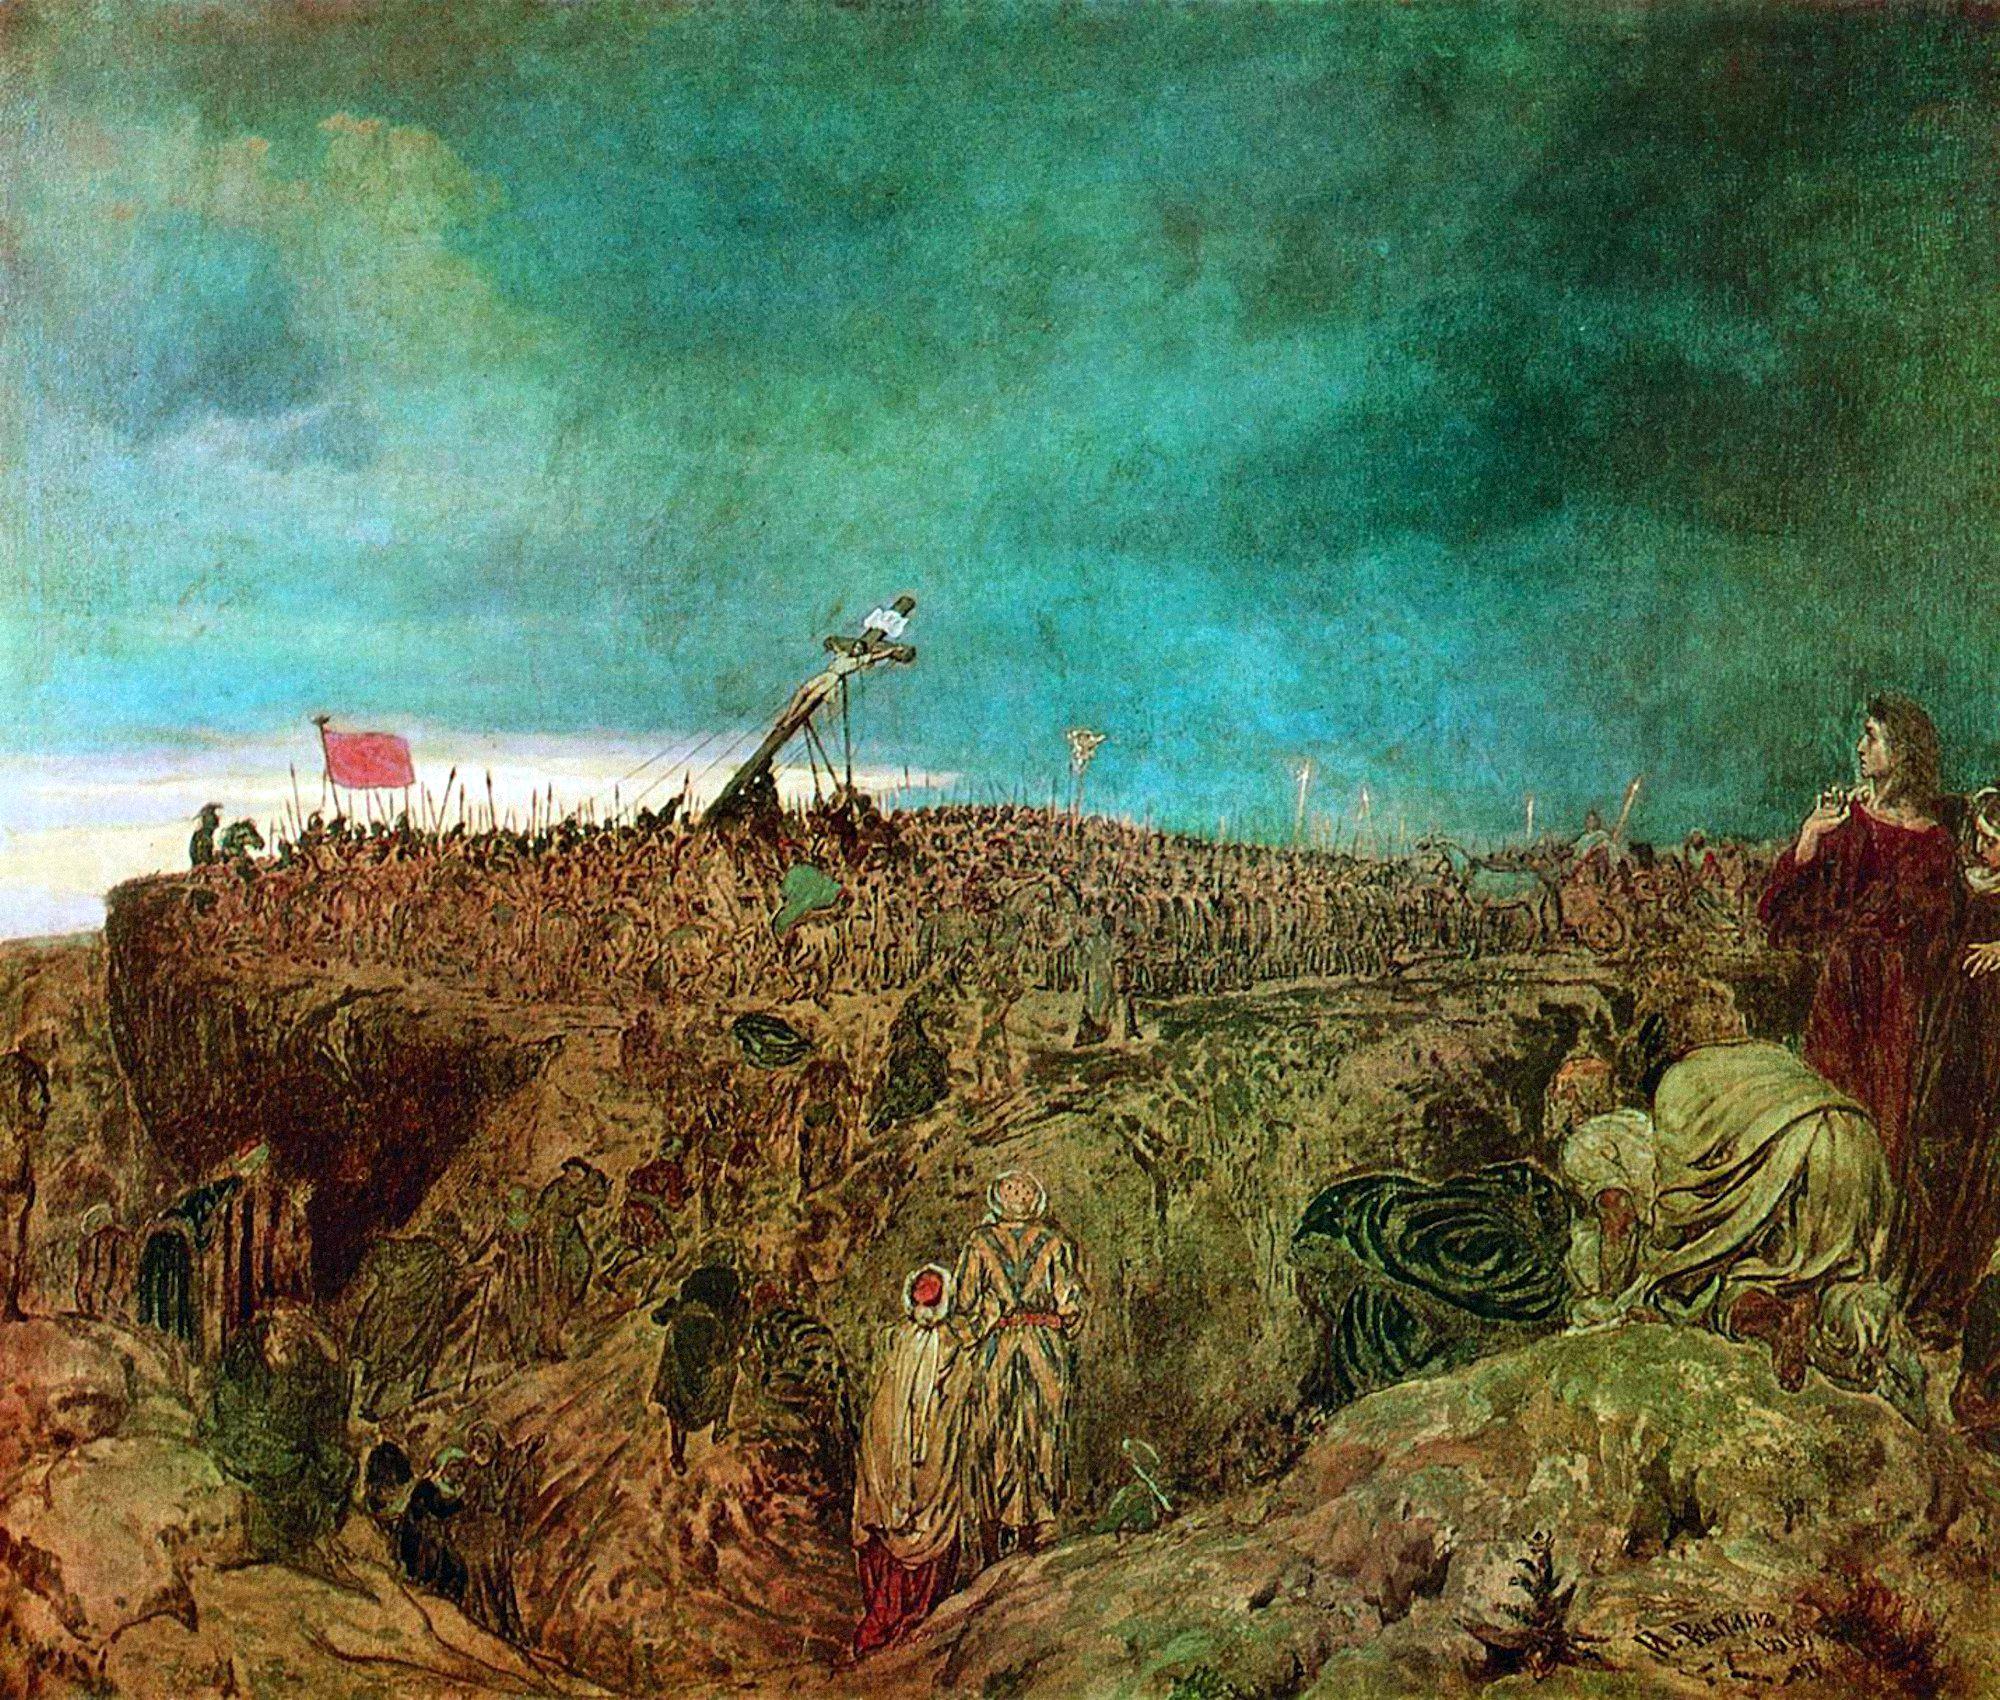 00 Ilya Repin. Golgotha (The Crucifixion of Christ). 1869